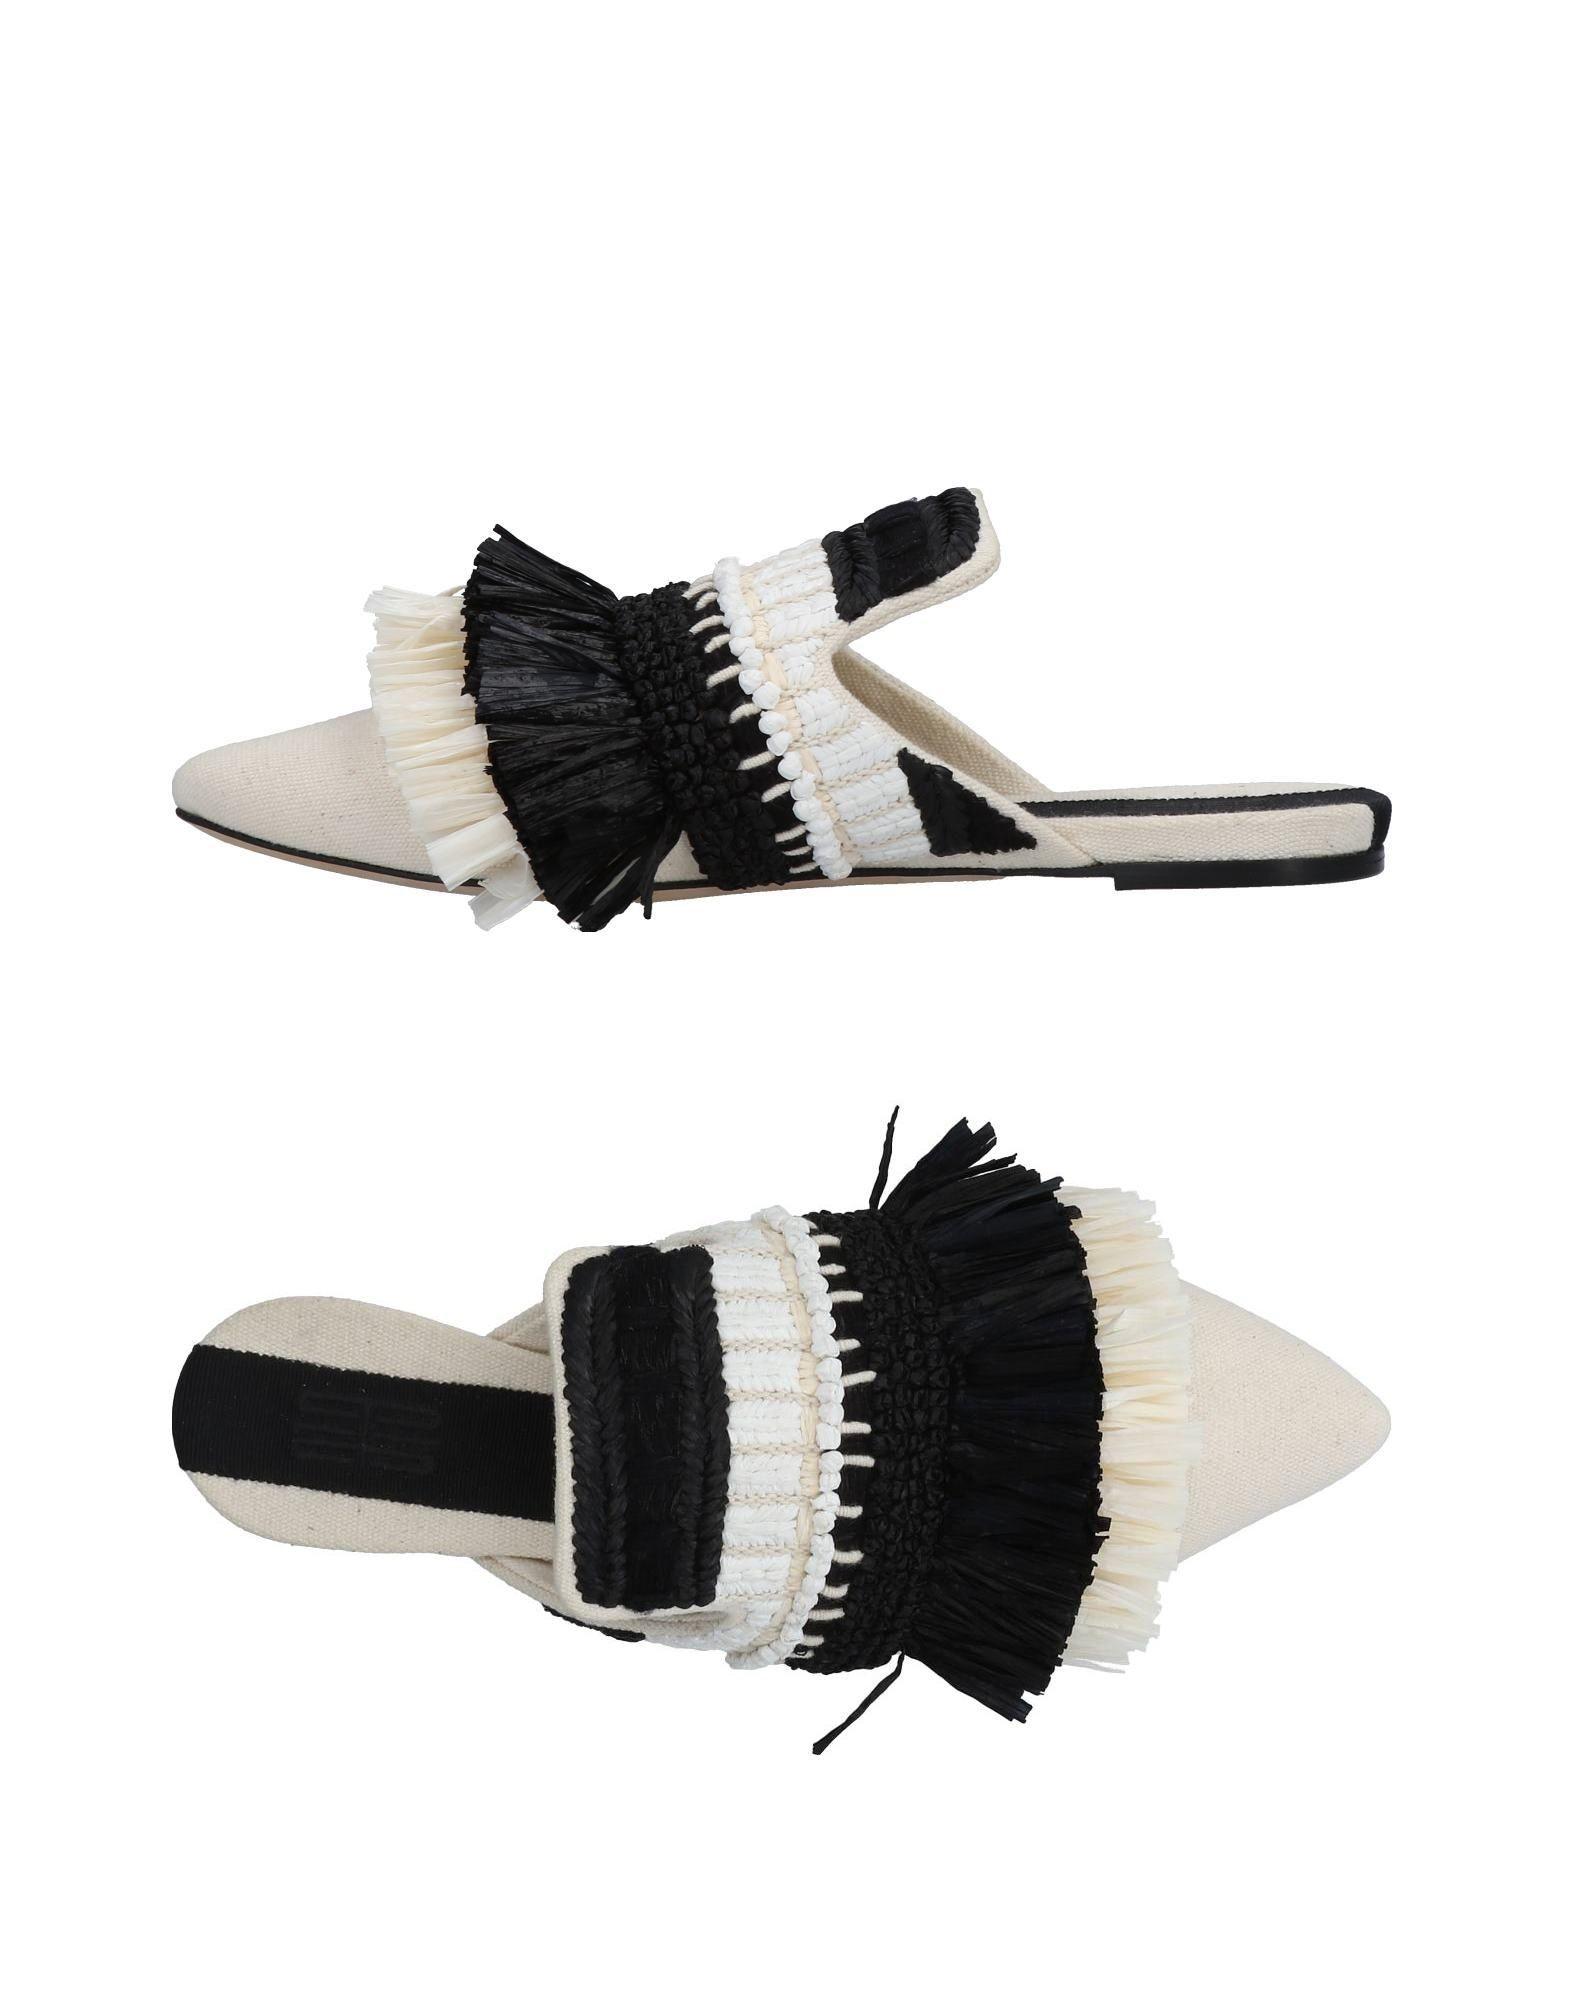 Sanayi 313 Pantoletten Damen Damen Damen  11491599HOGünstige gut aussehende Schuhe 5ce37b